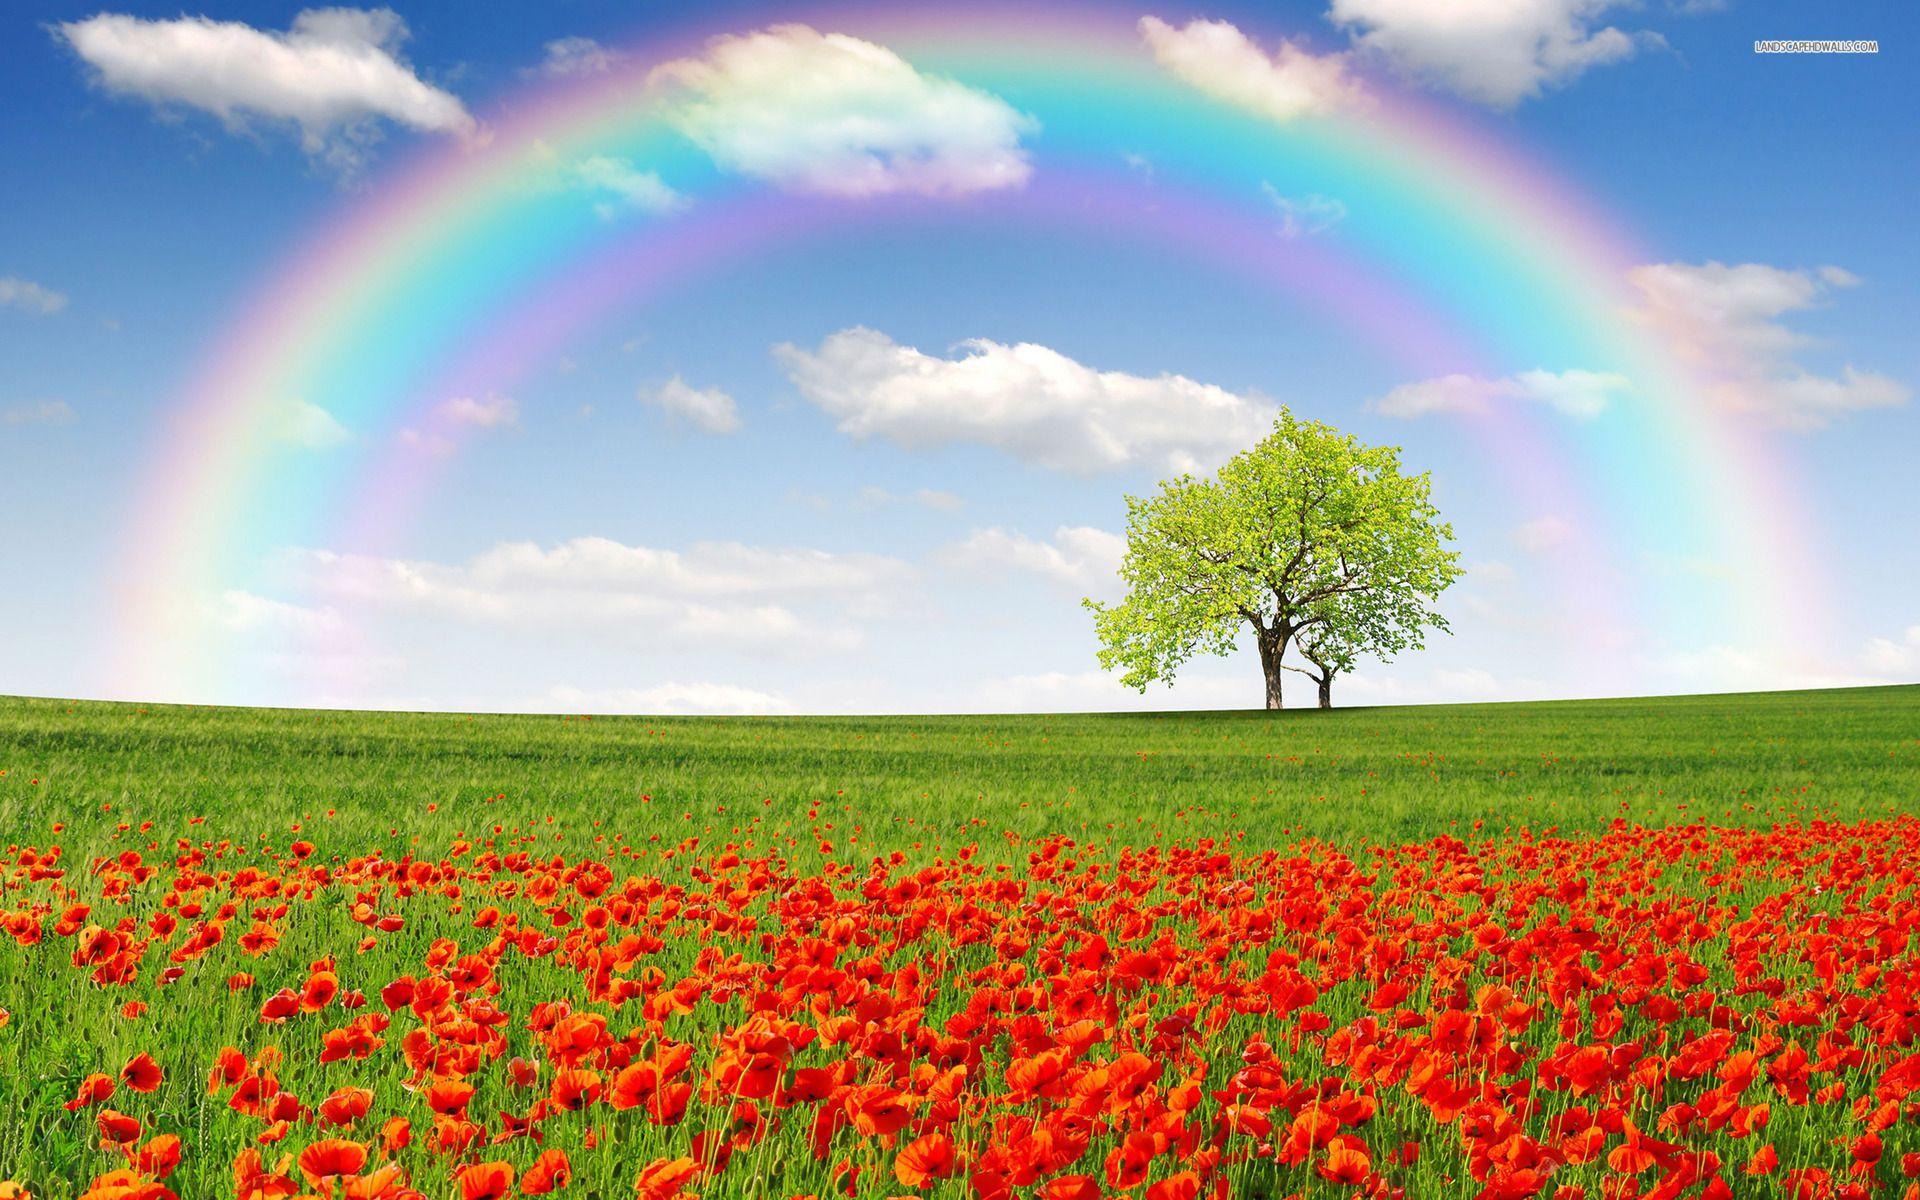 f29279d239503 Poppy Field Trees Rainbow Sky desktop PC and Mac wallpaper ...